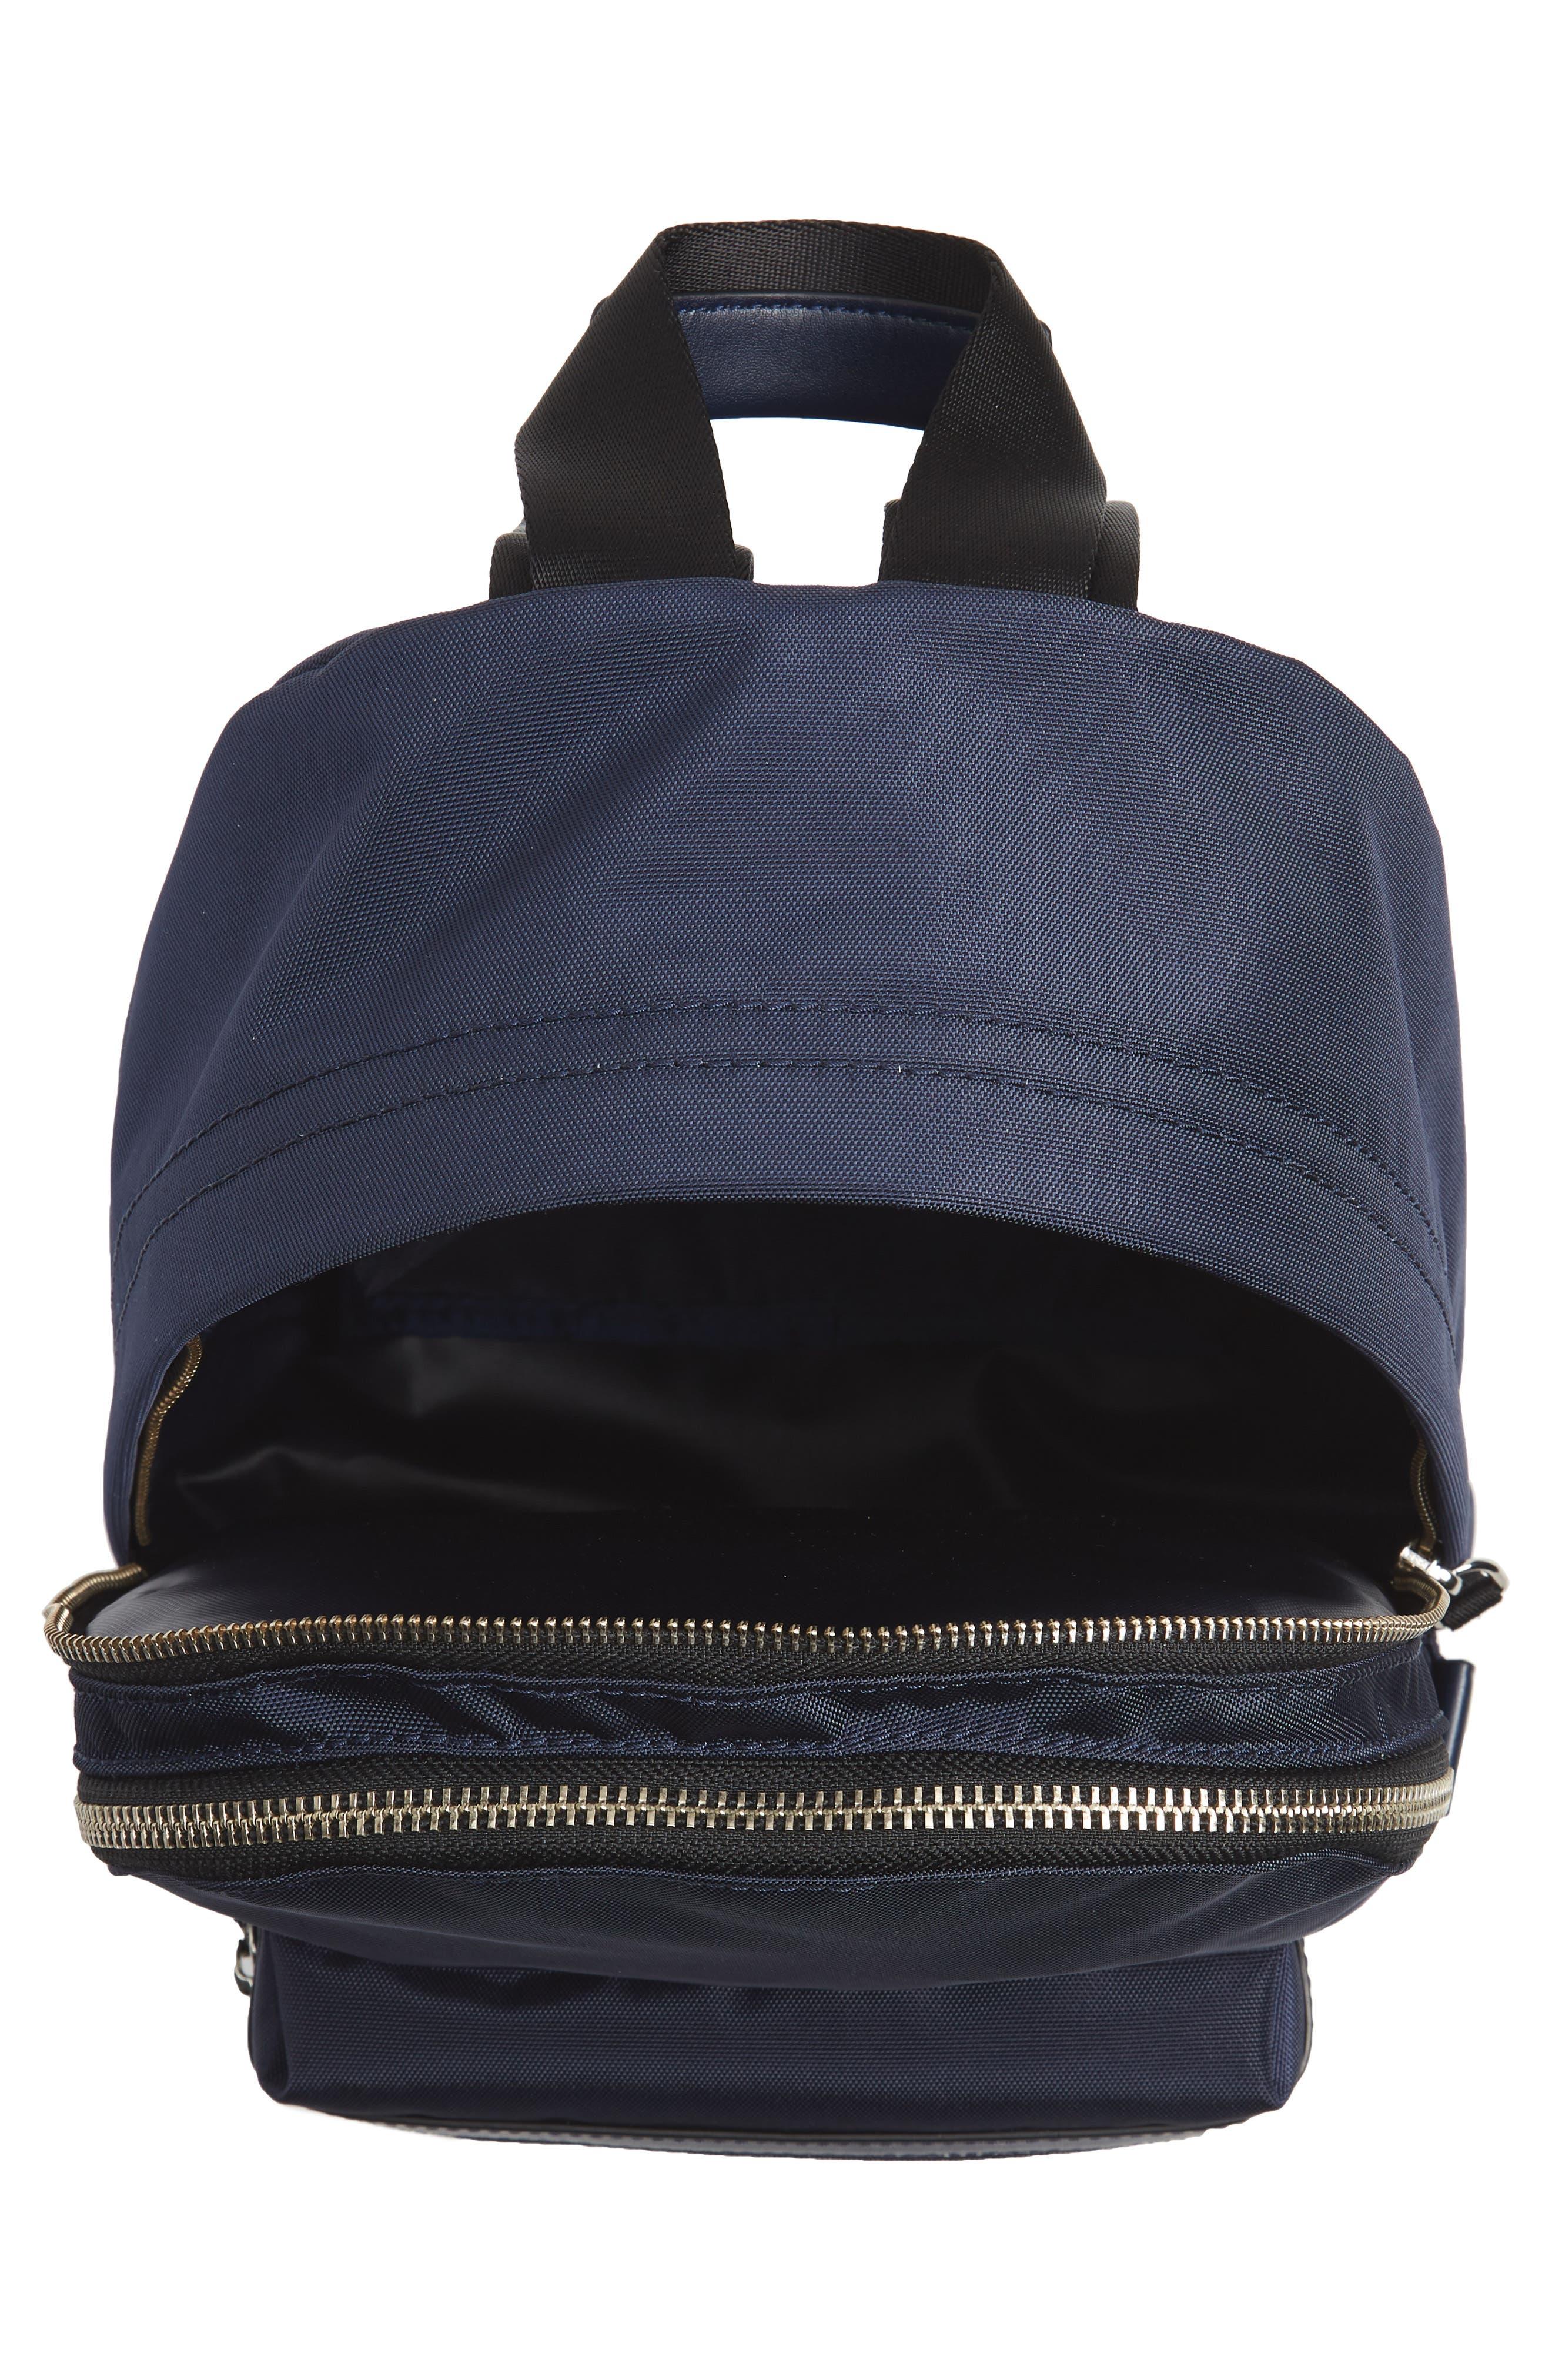 Medium Trek Nylon Backpack,                             Alternate thumbnail 4, color,                             MIDNIGHT BLUE